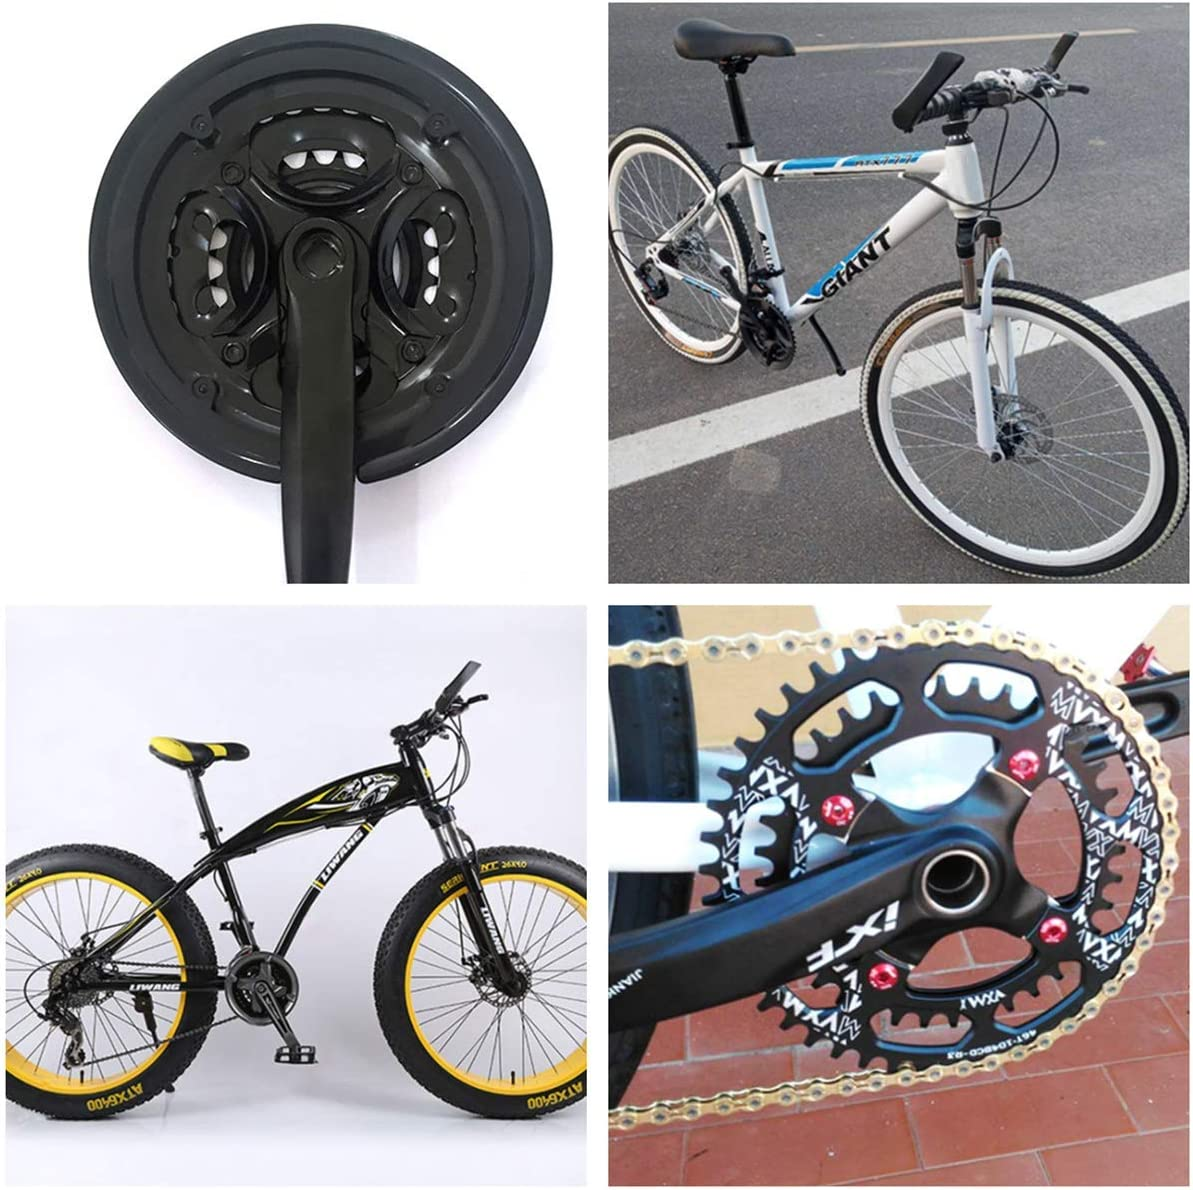 N\A Bike Sprocket Cover Bike Chain Guard Protector Black Plastic Cycling Crank Ring Protector for Bicycle Road Bike Mountain Bike